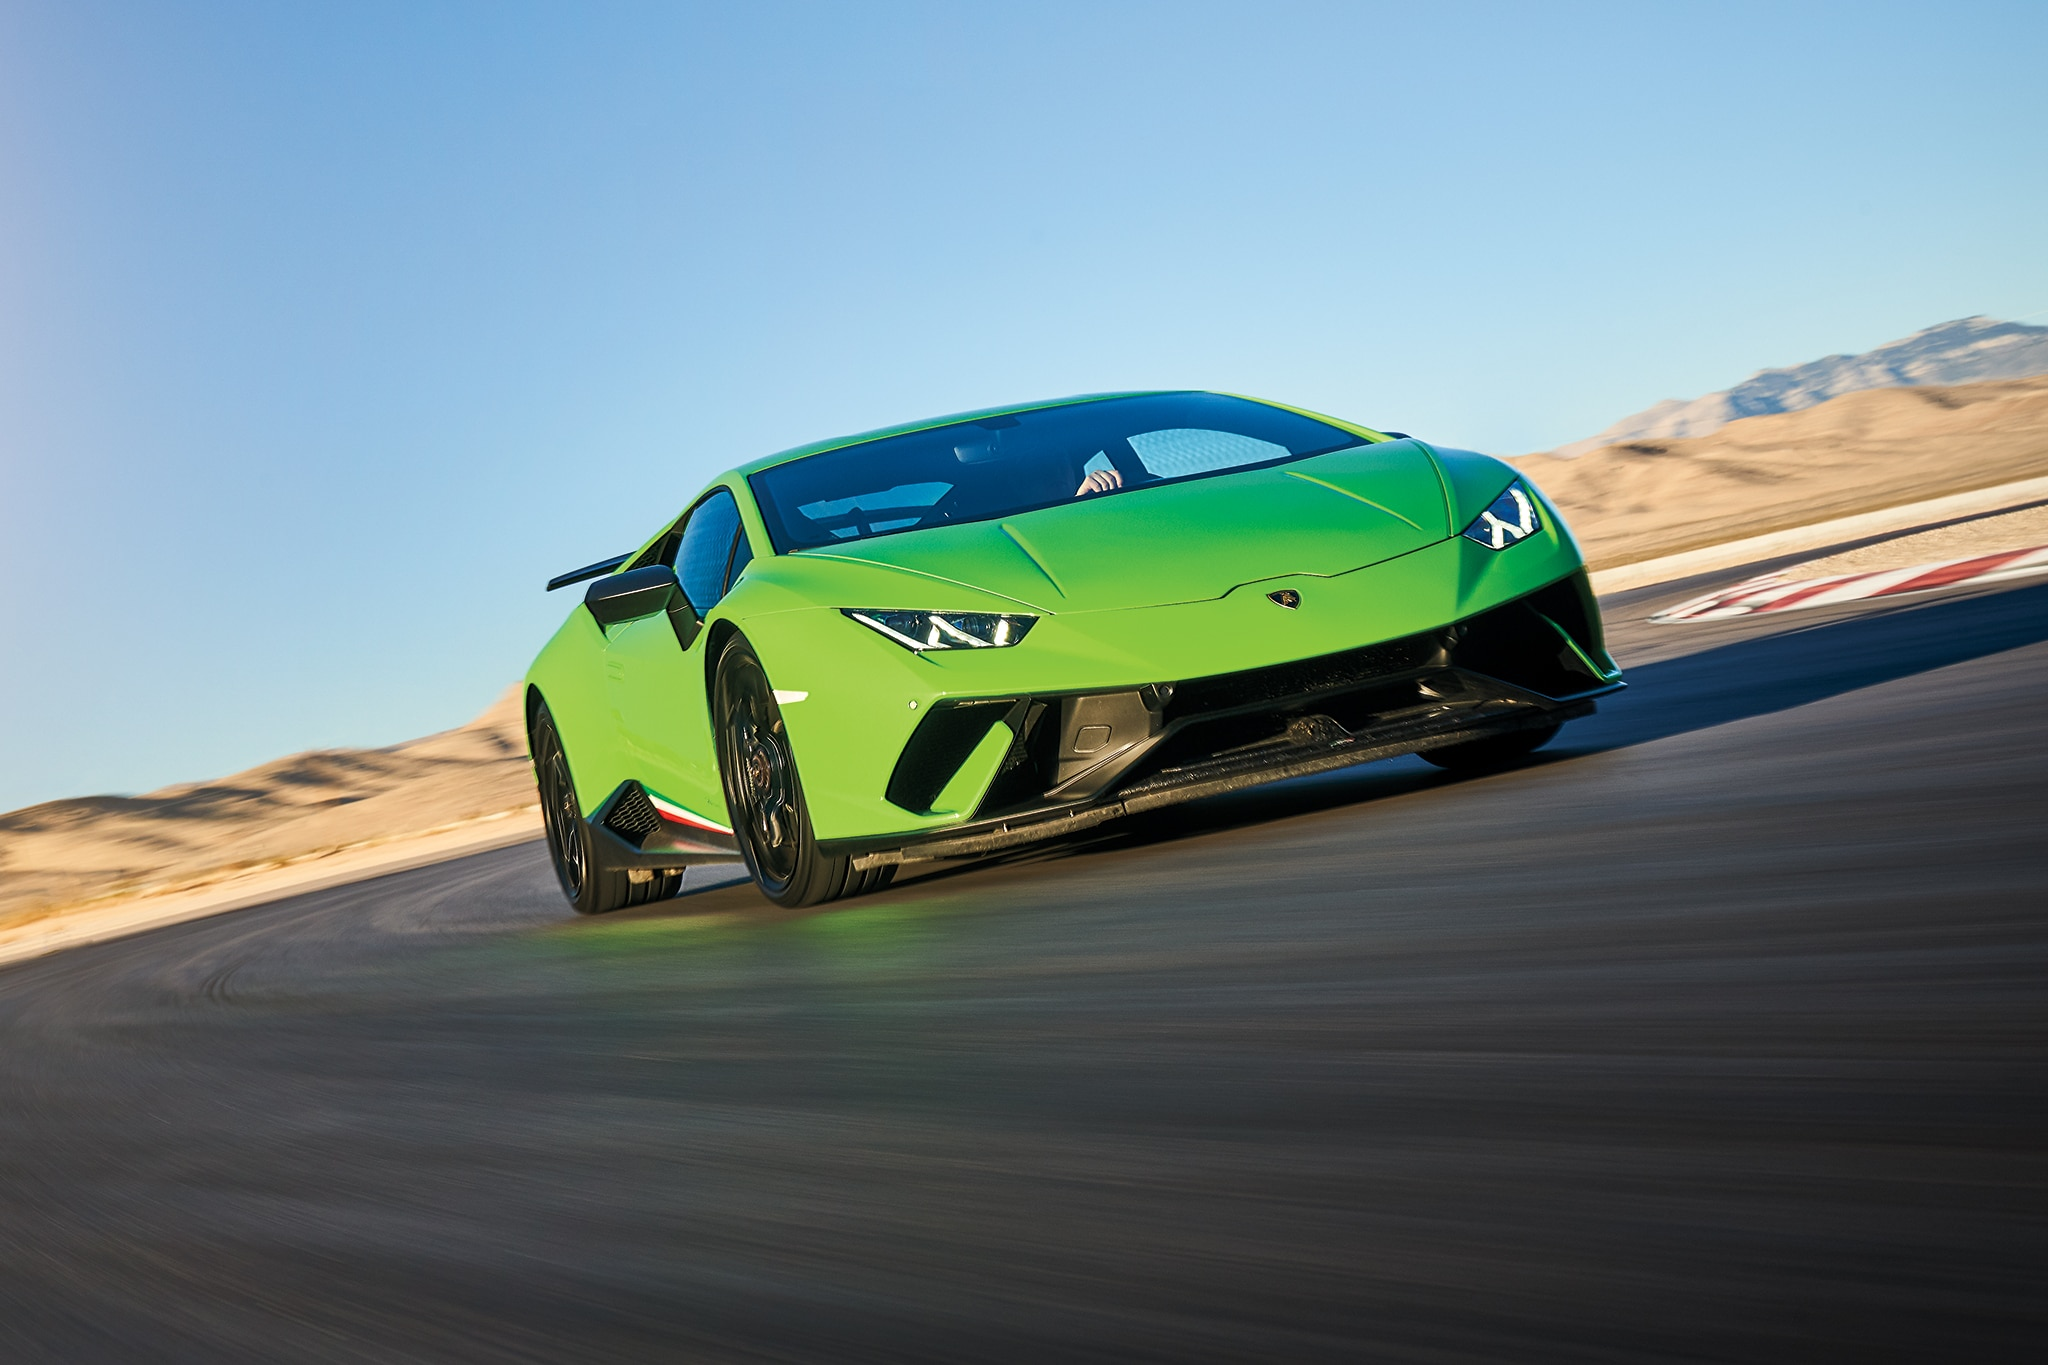 2018 Lamborghini Huracán Performante All Star Contender 02